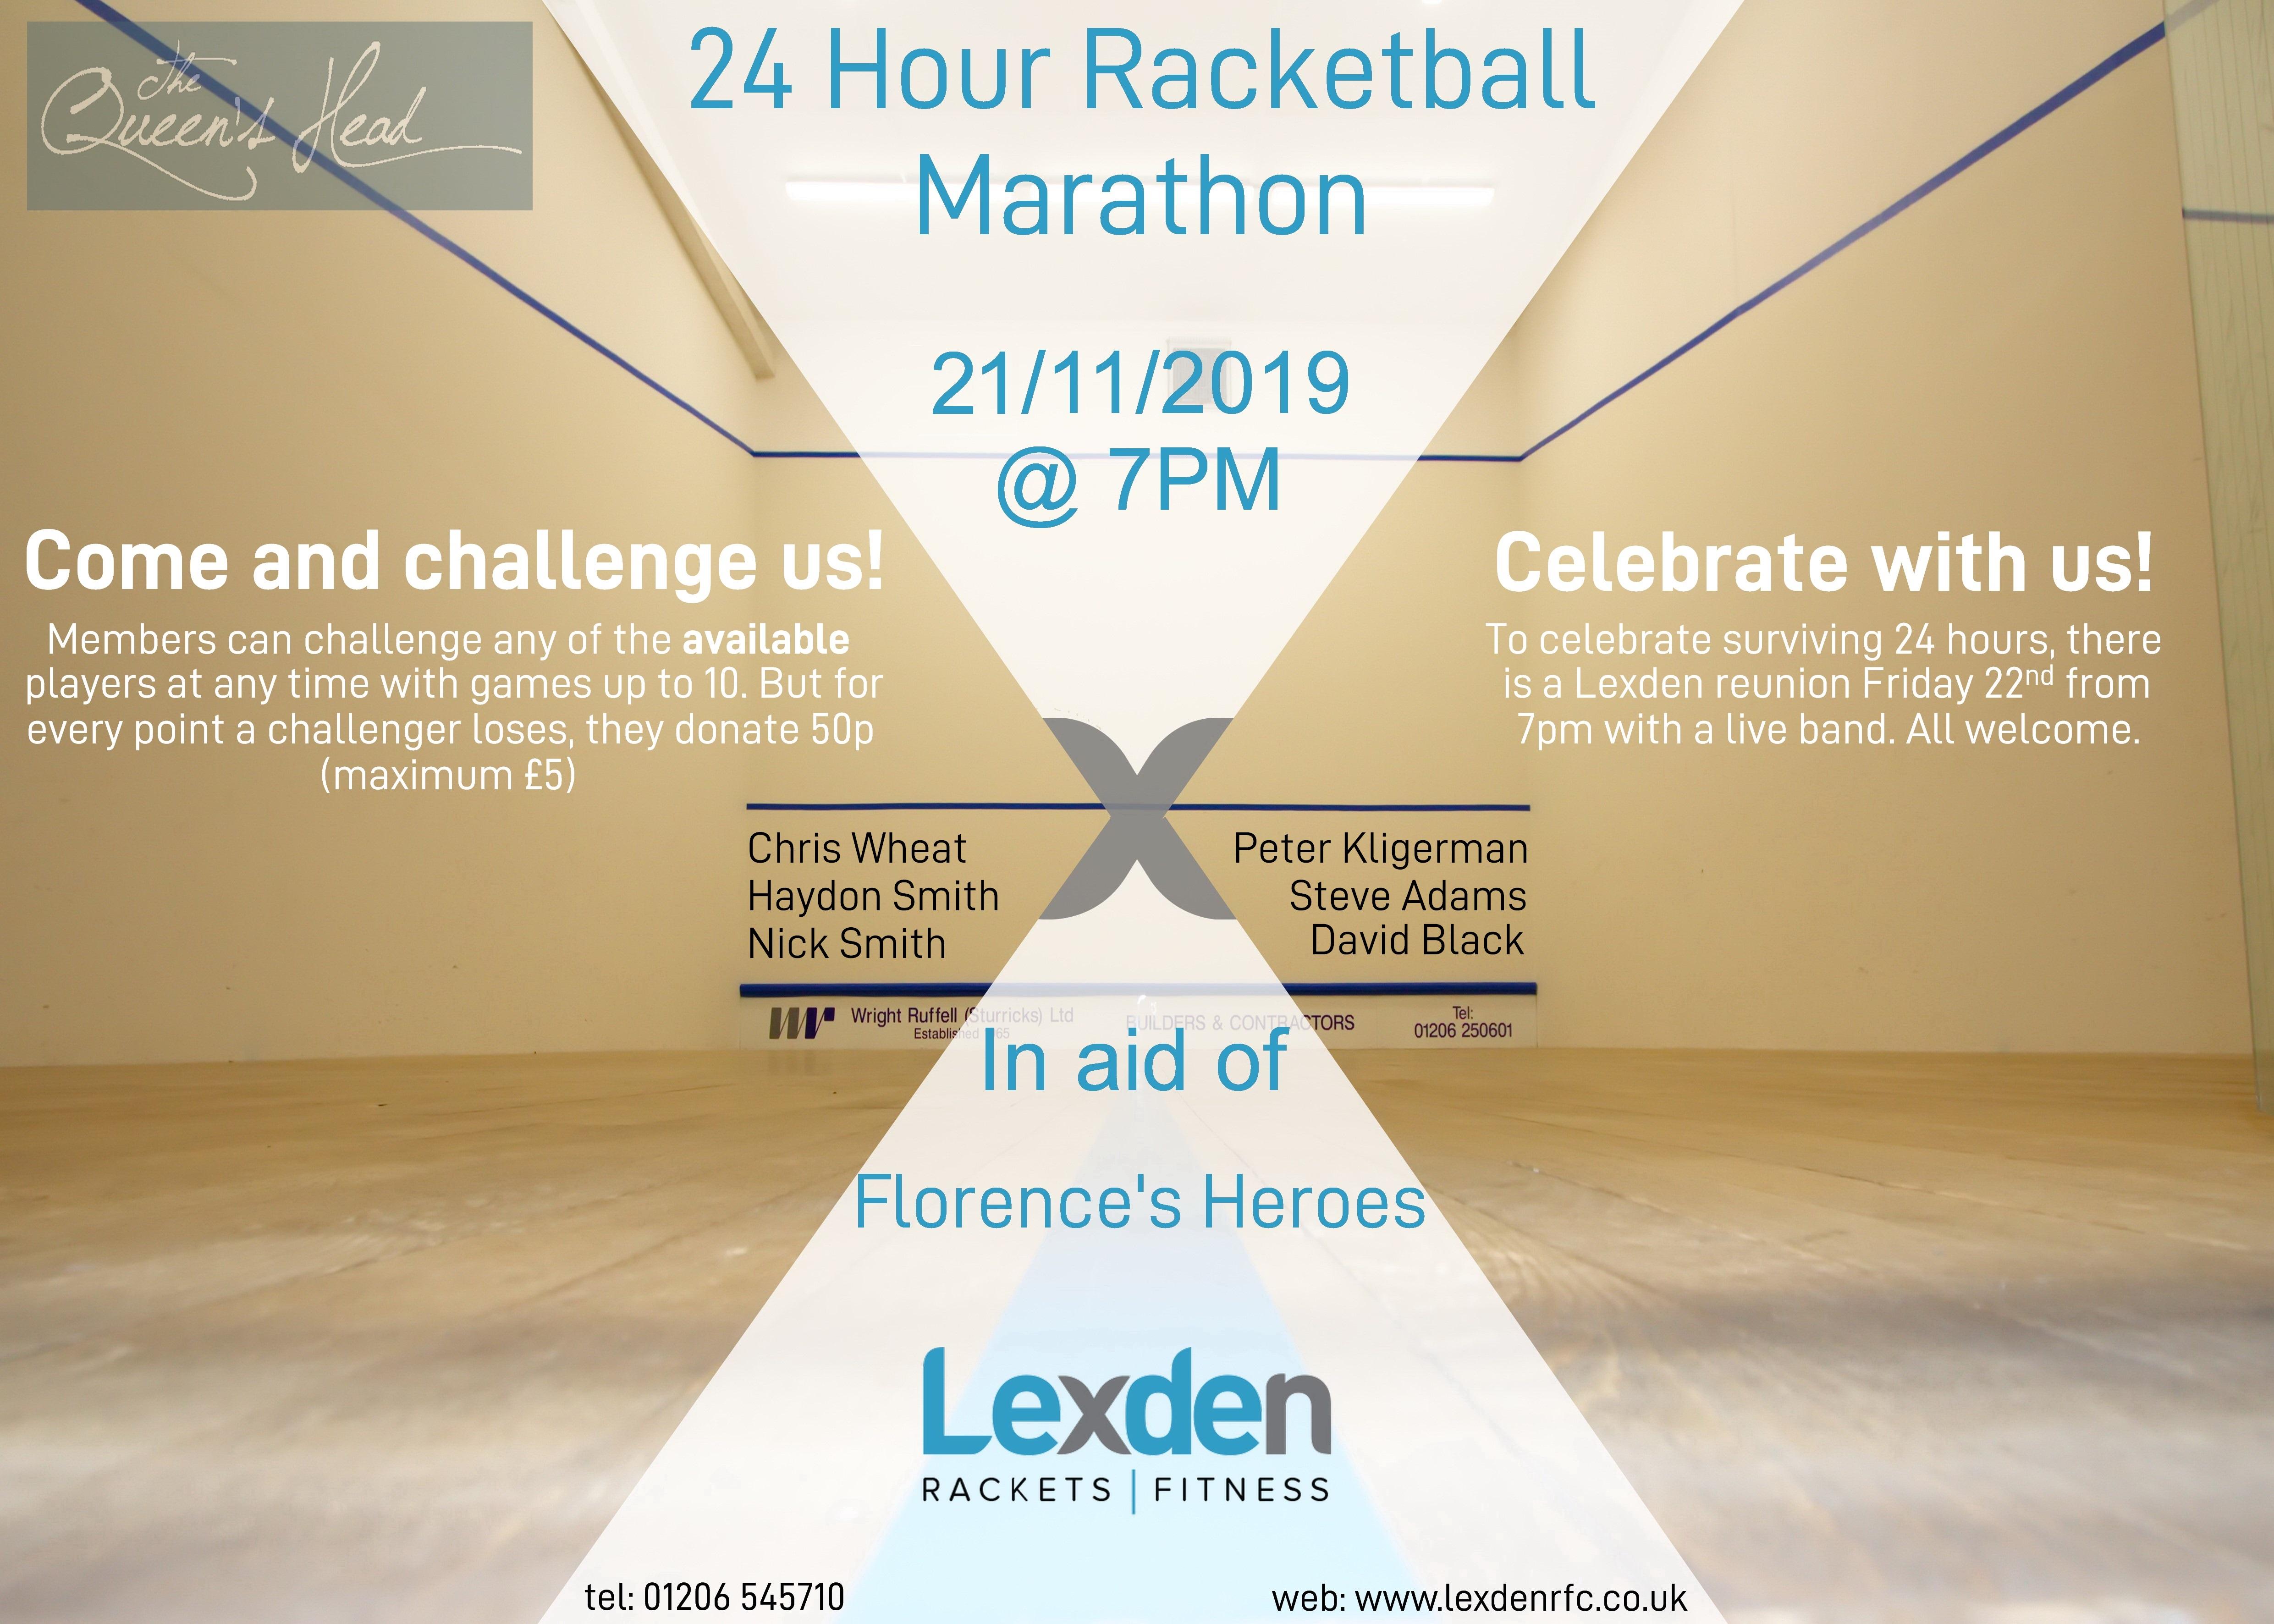 24 hour Racketball Marathon – 21st Nov